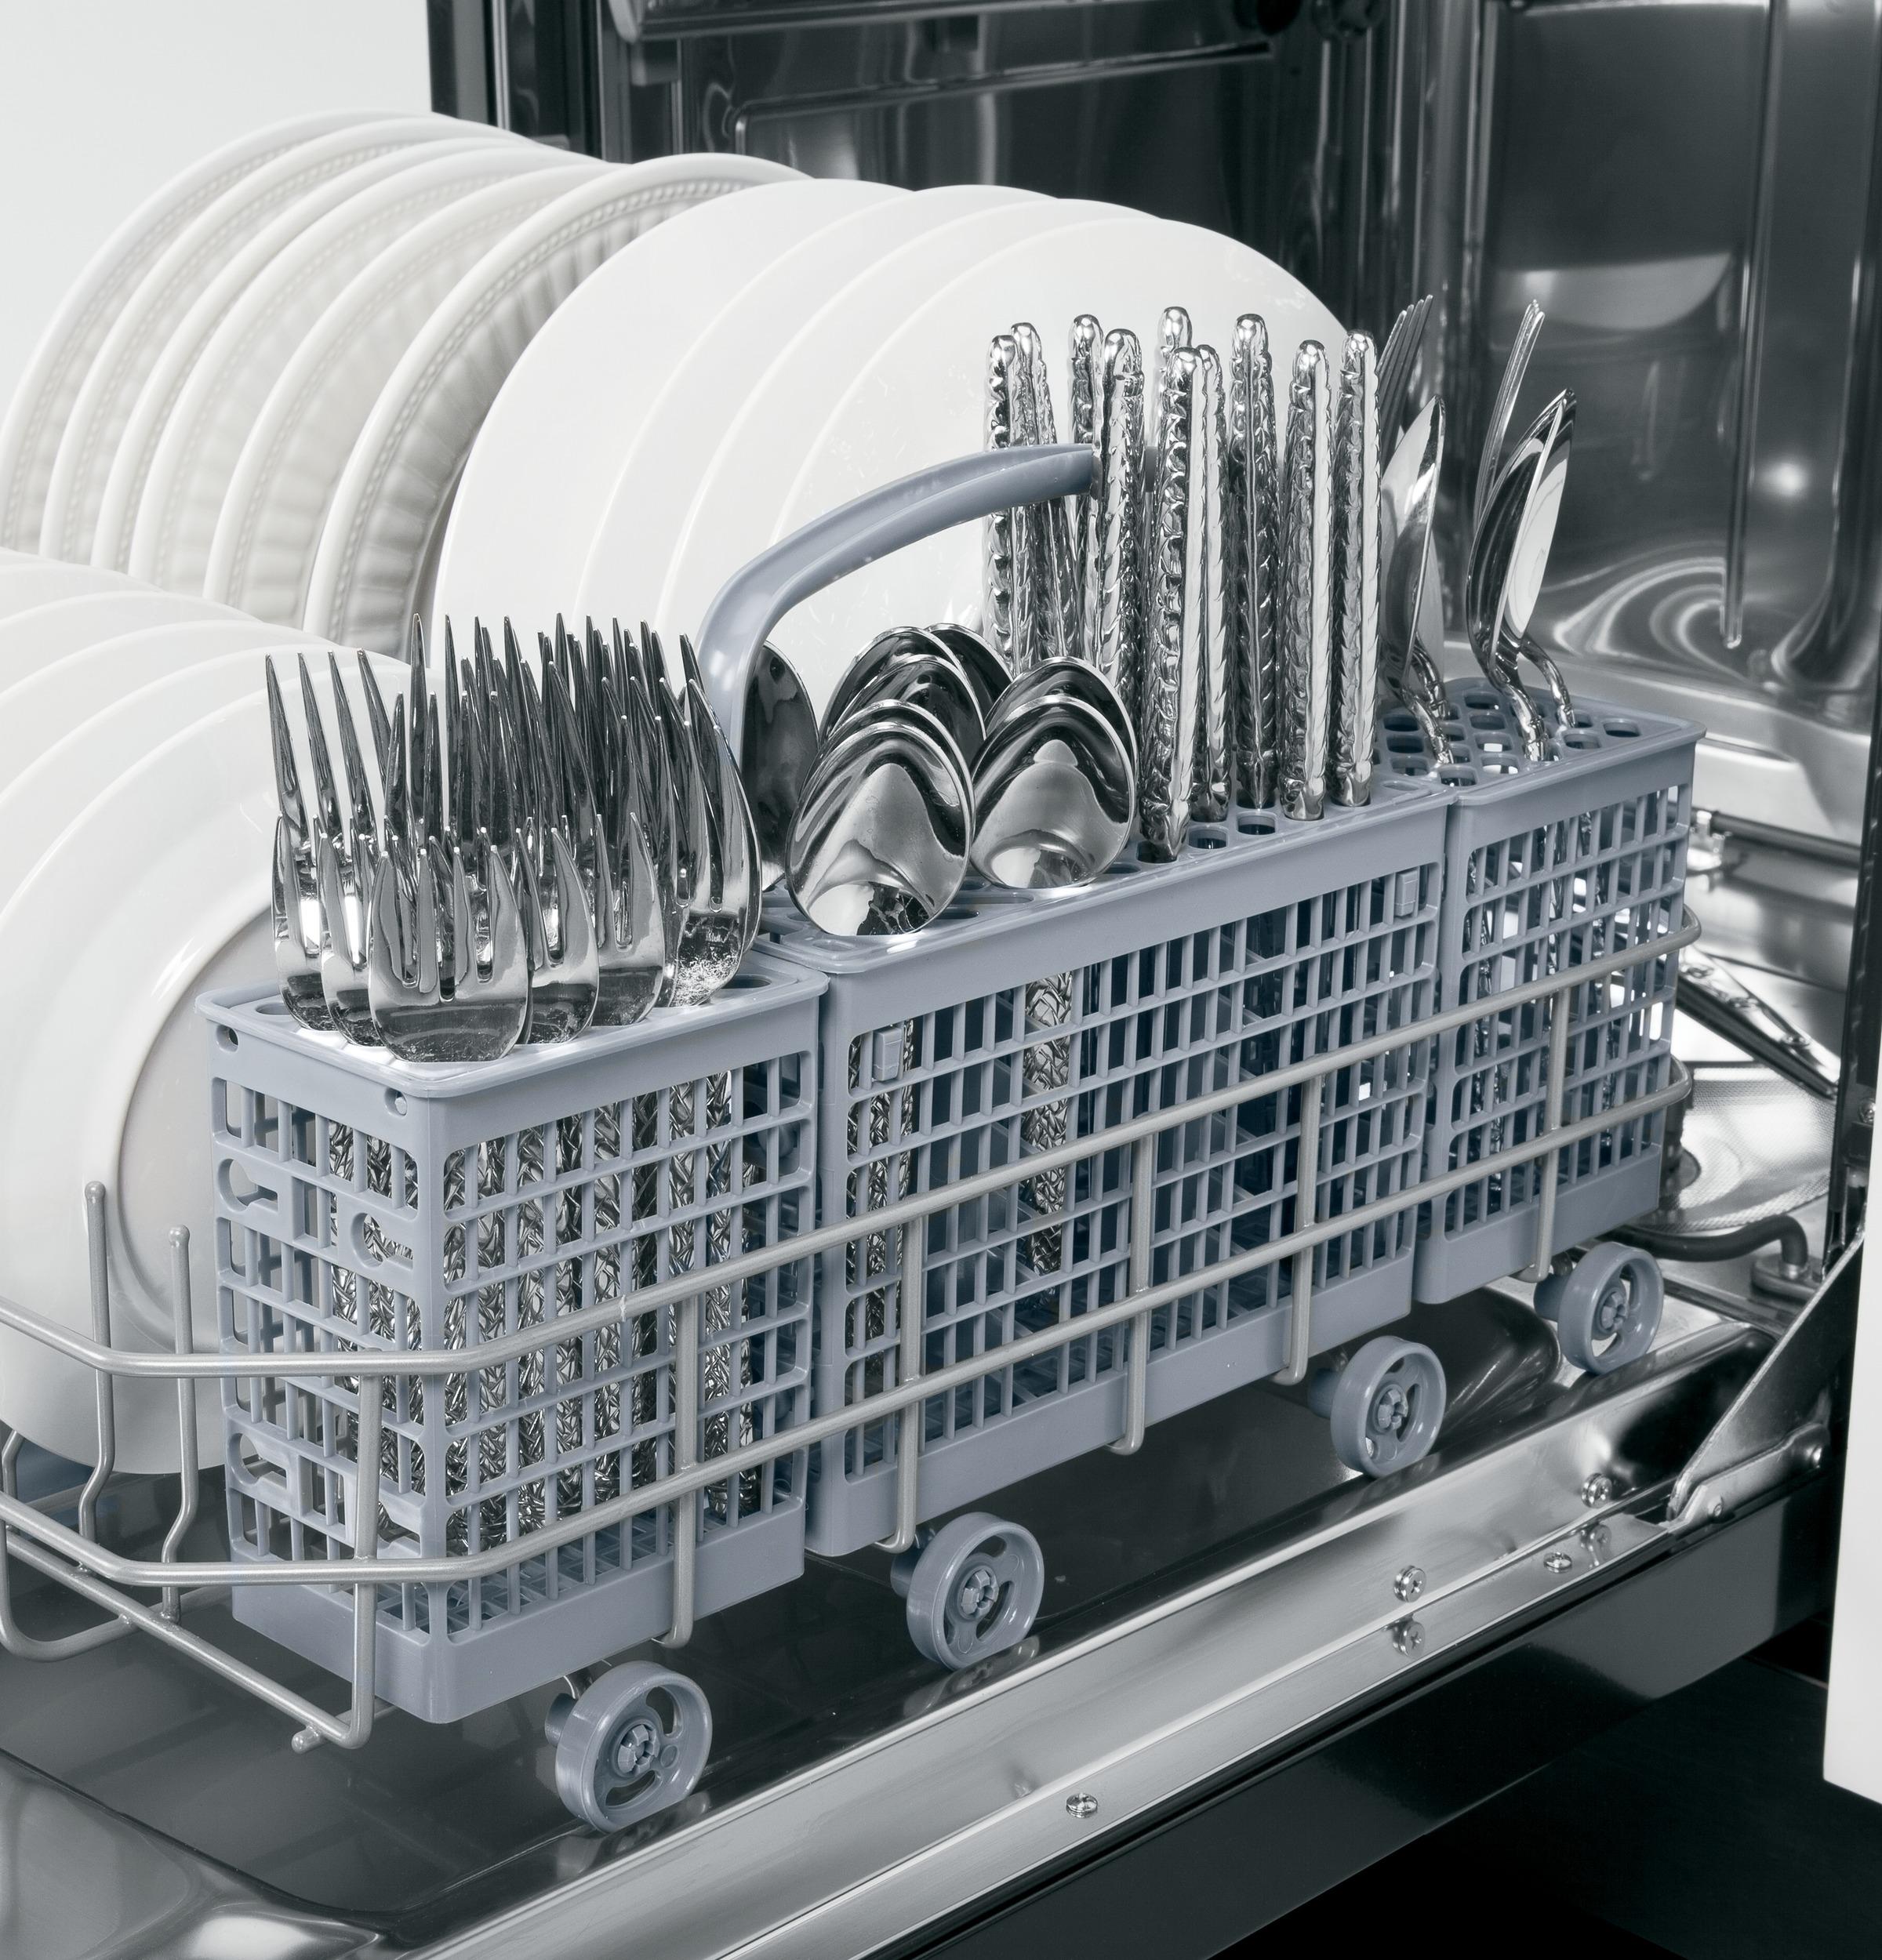 Model: GLDT690JBB | GE GE® Built-In Dishwasher with Hidden Controls